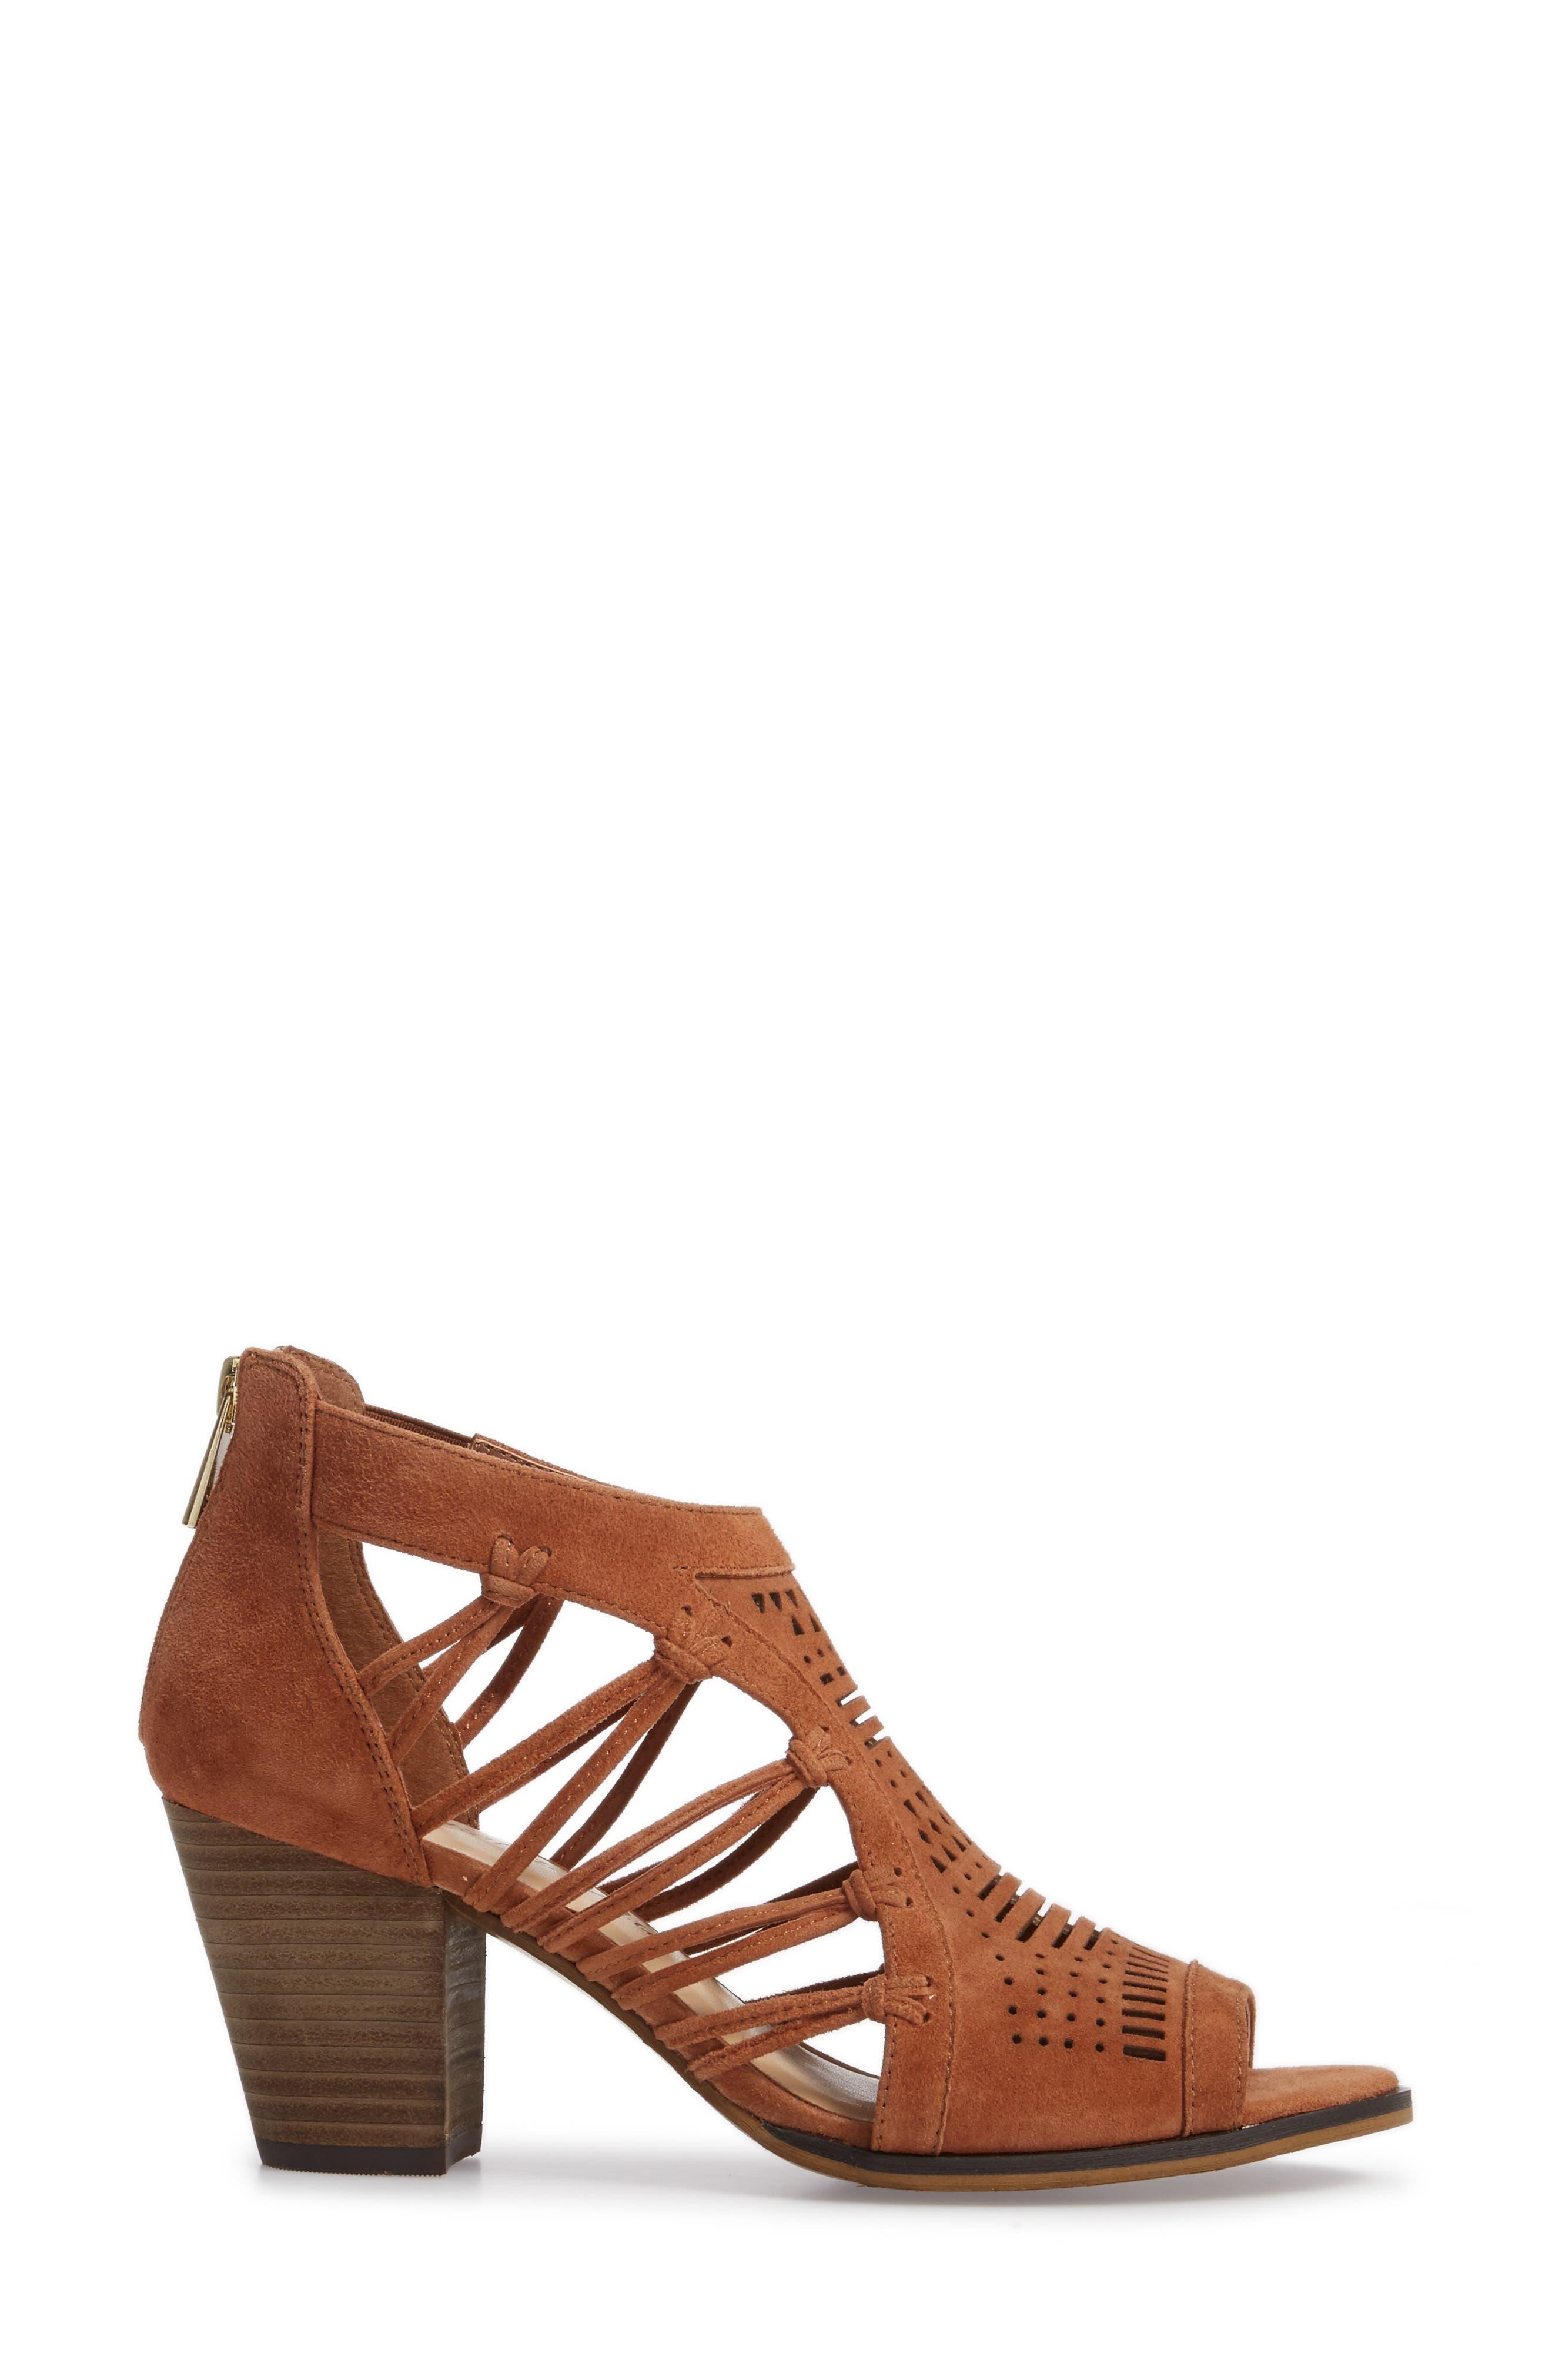 Kortez Block Heel Sandal,                             Alternate thumbnail 3, color,                             Dark Tan Suede